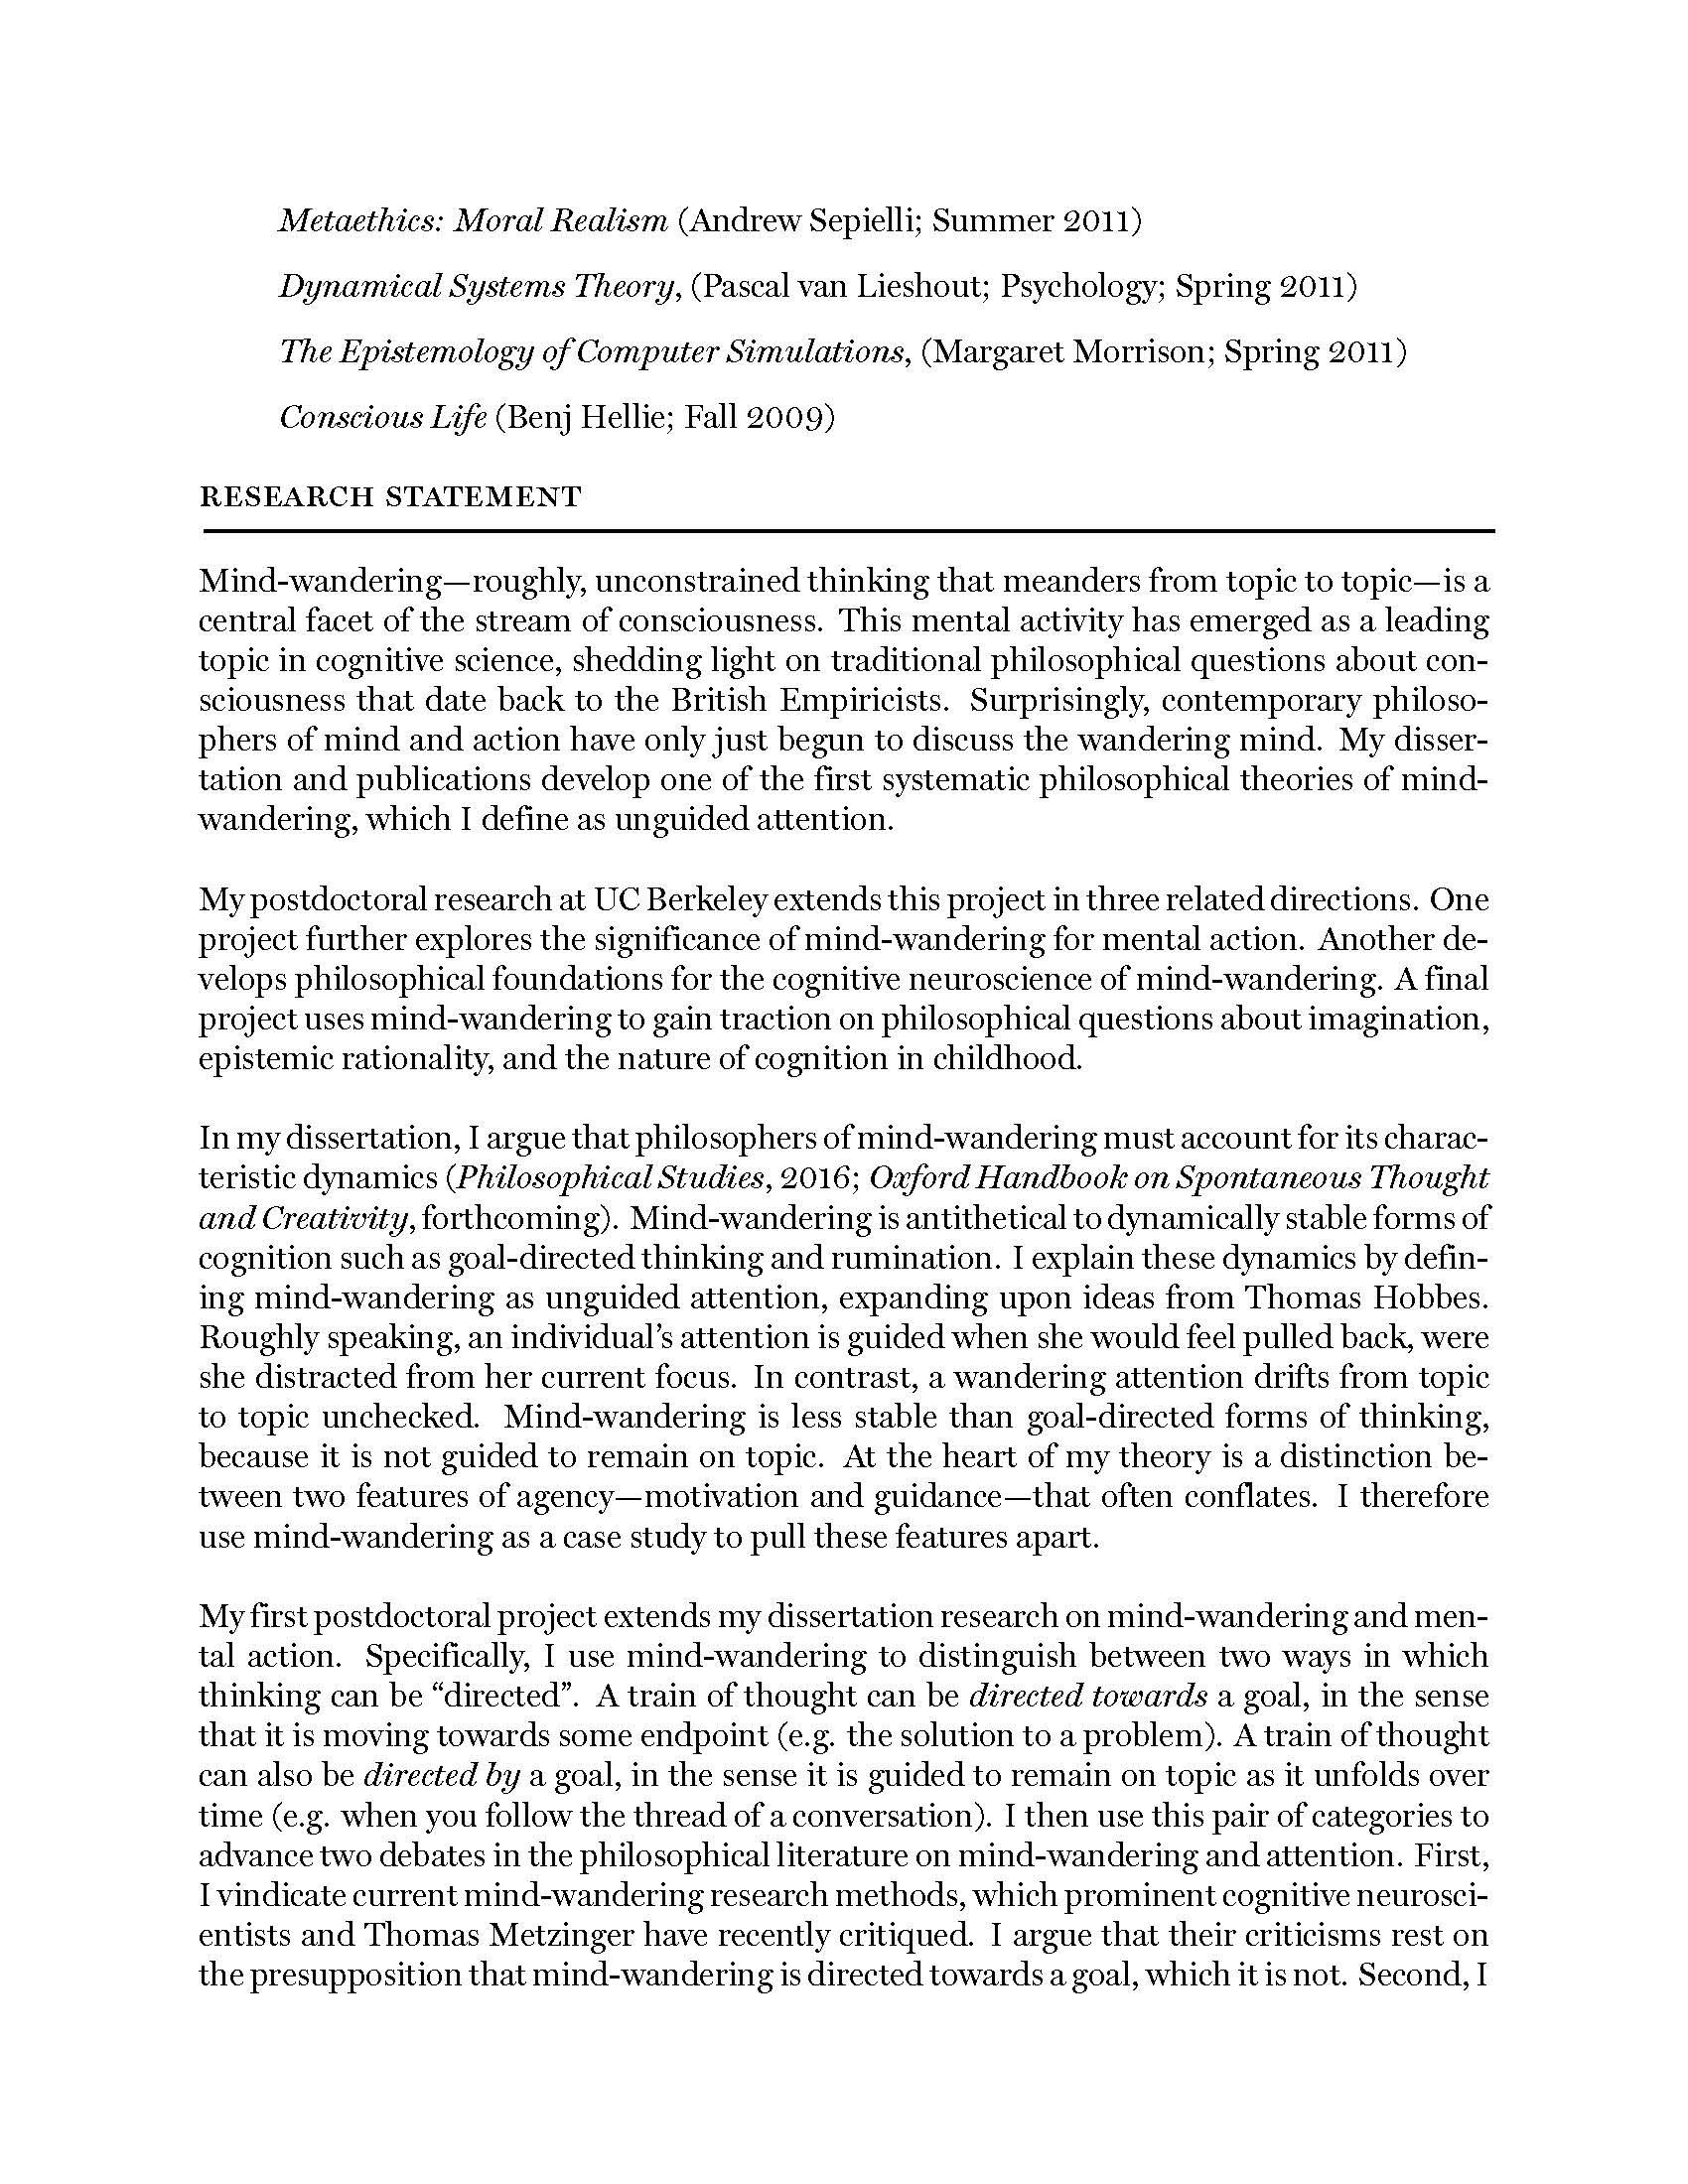 Irving CV - March 26 2017 (statement)_Page_7.jpg